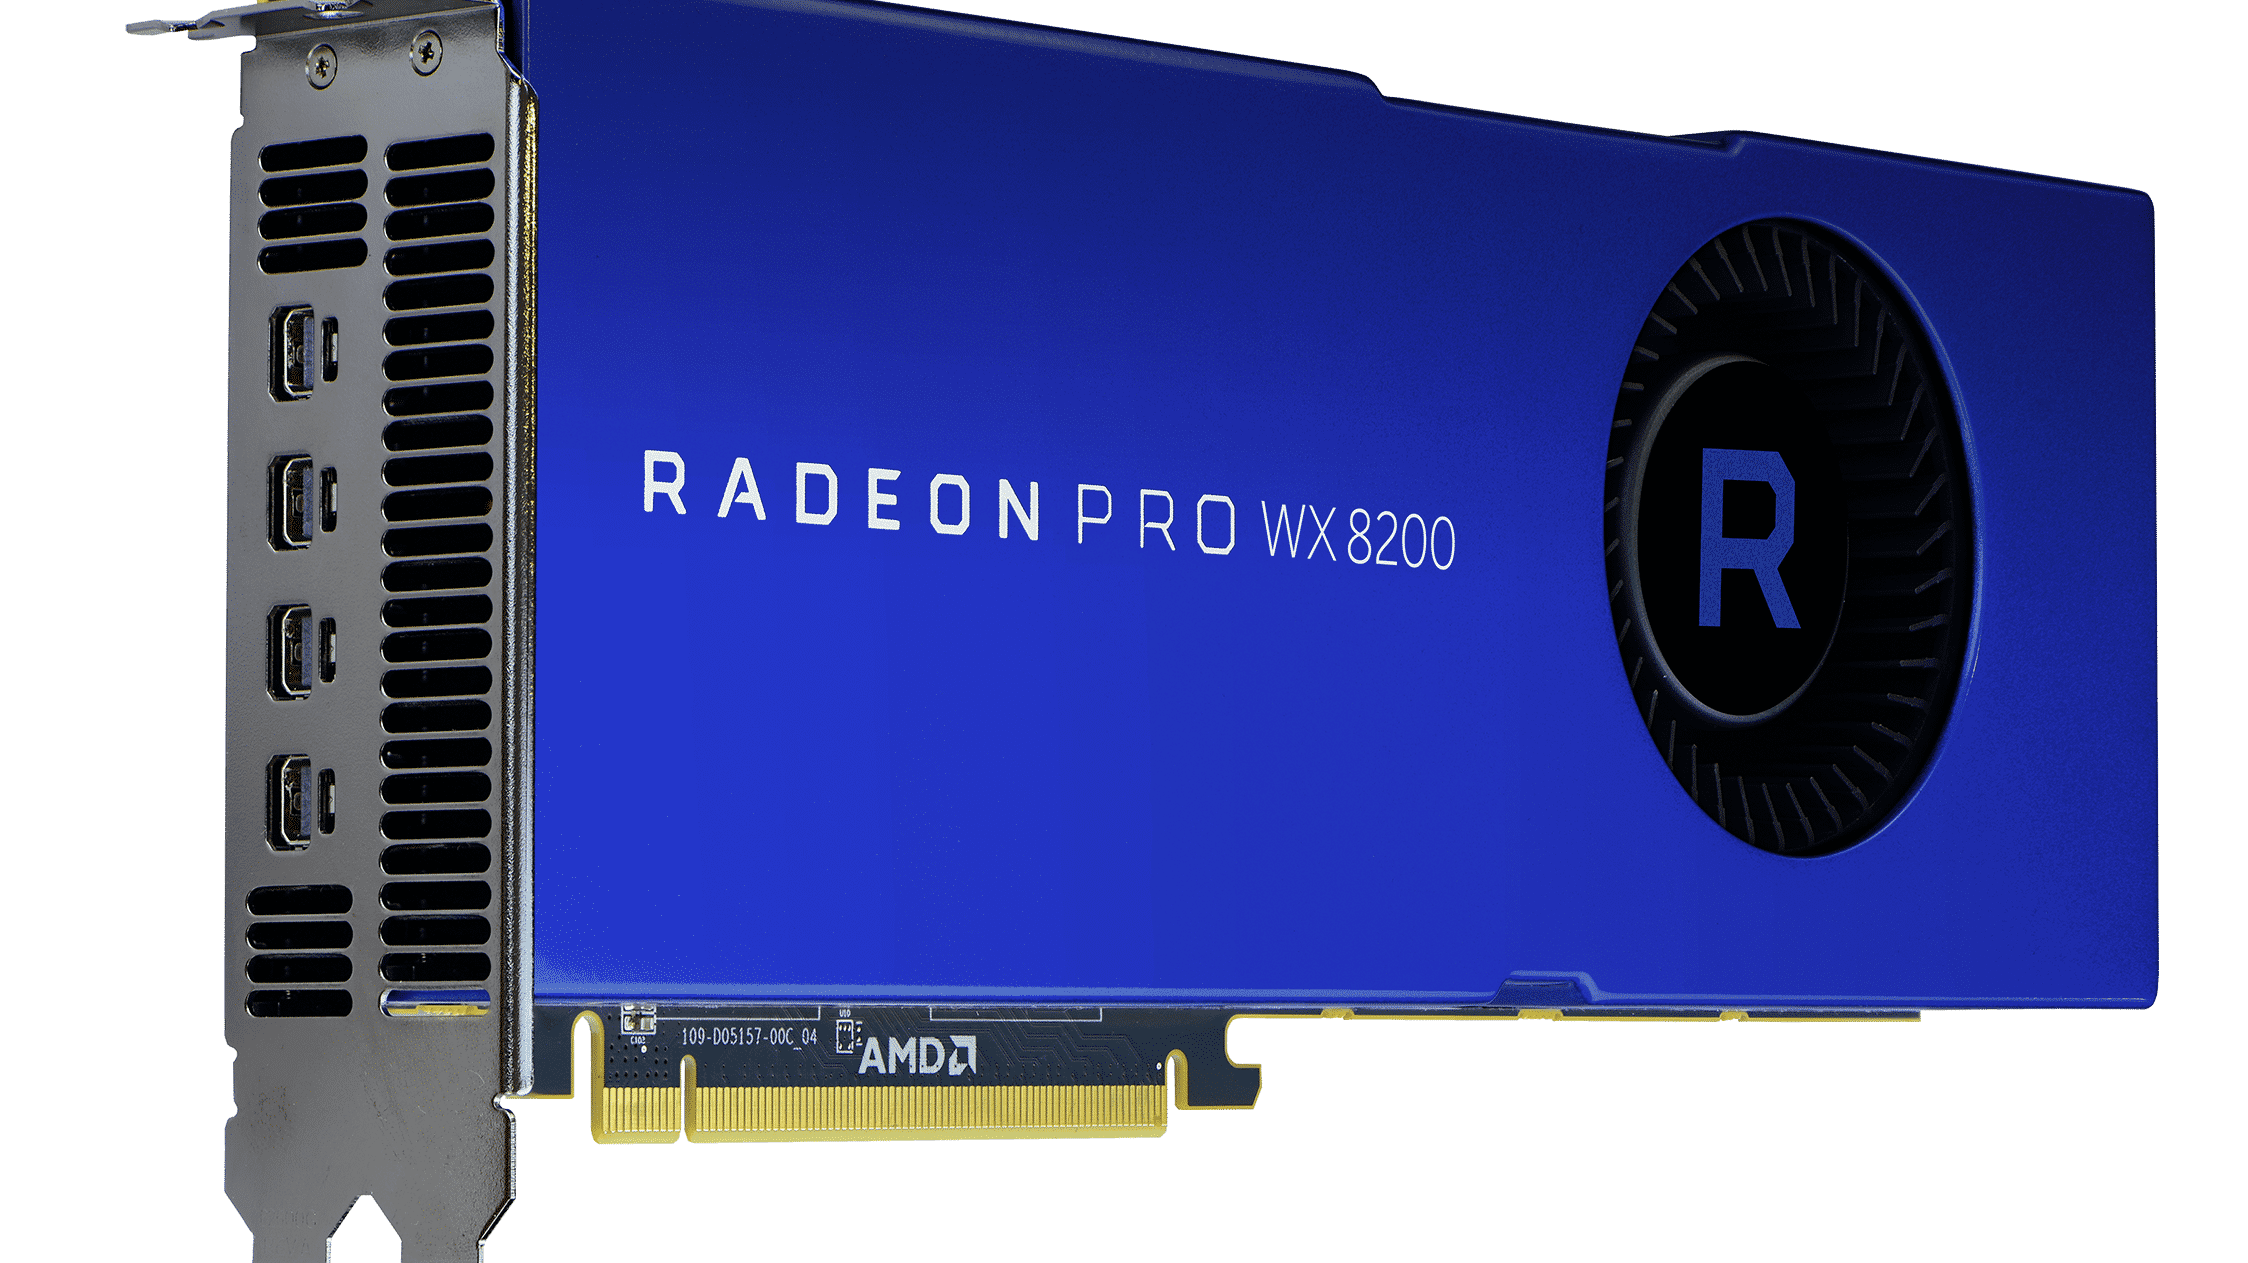 Radeon Pro WX 8200: AMD stellt neue Profi-Grafikkarte vor